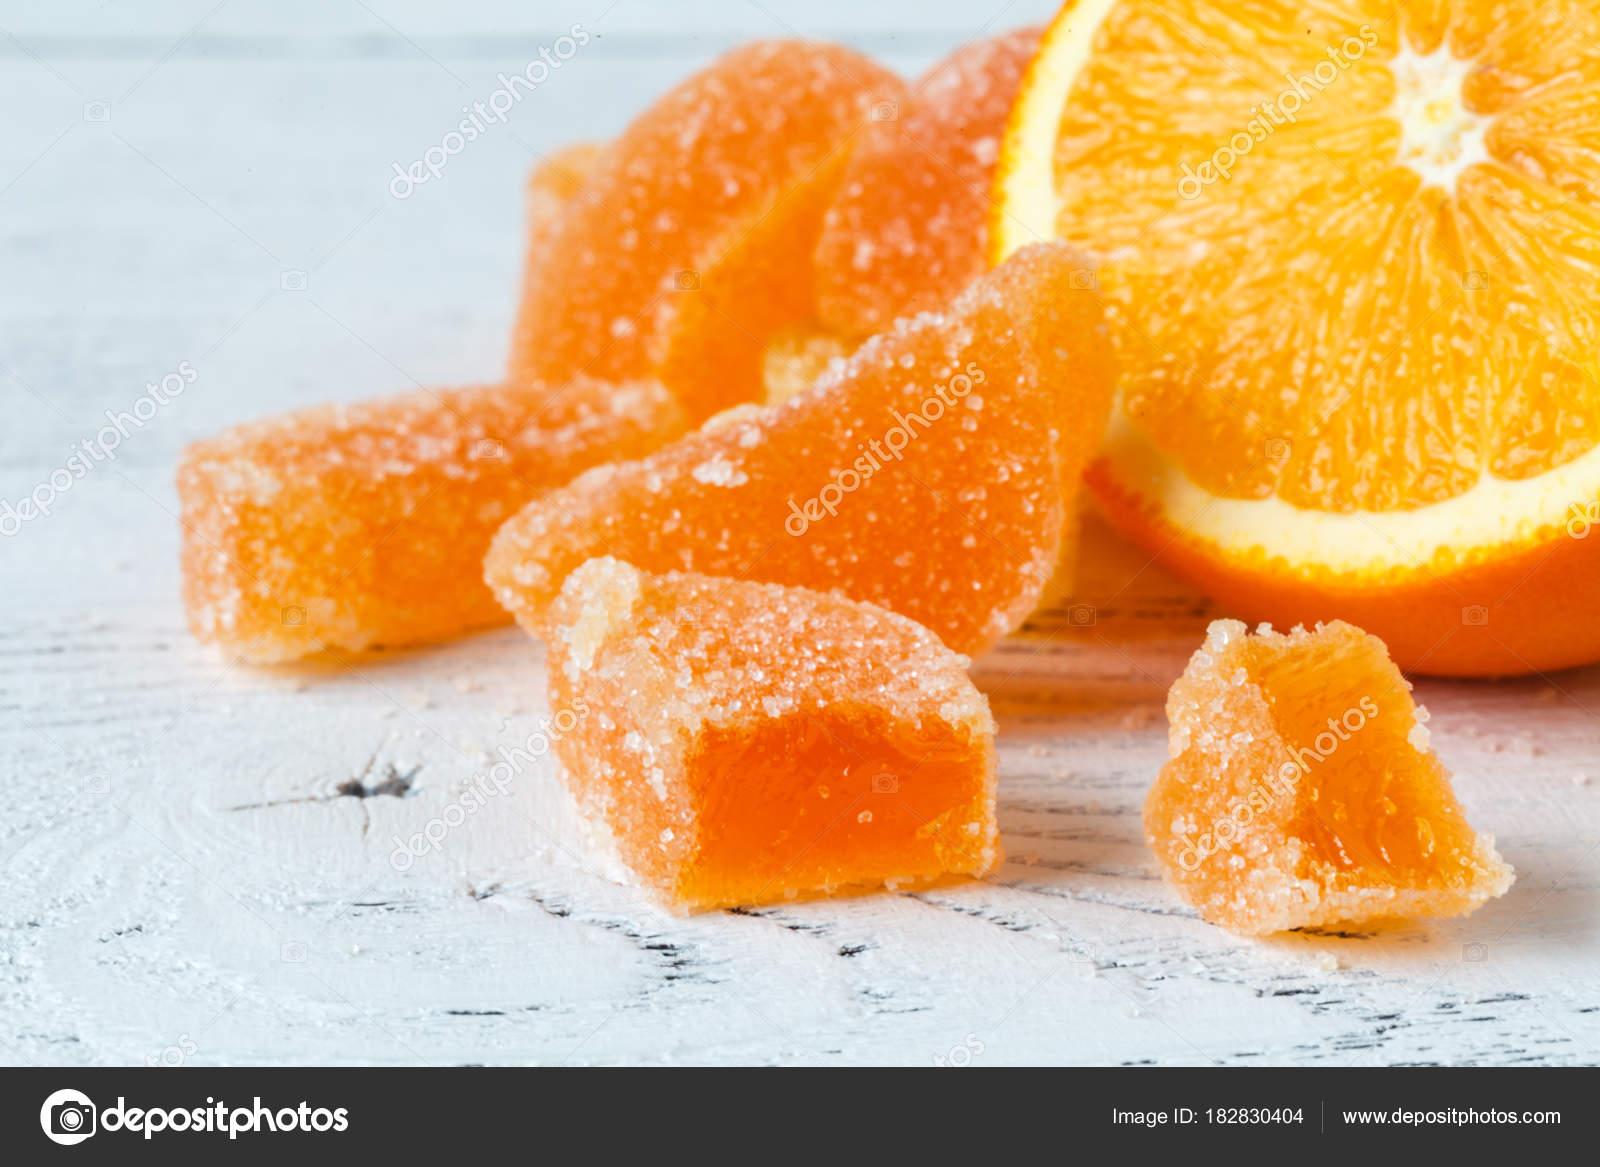 orange marmelad with slided oranges on table stock photo